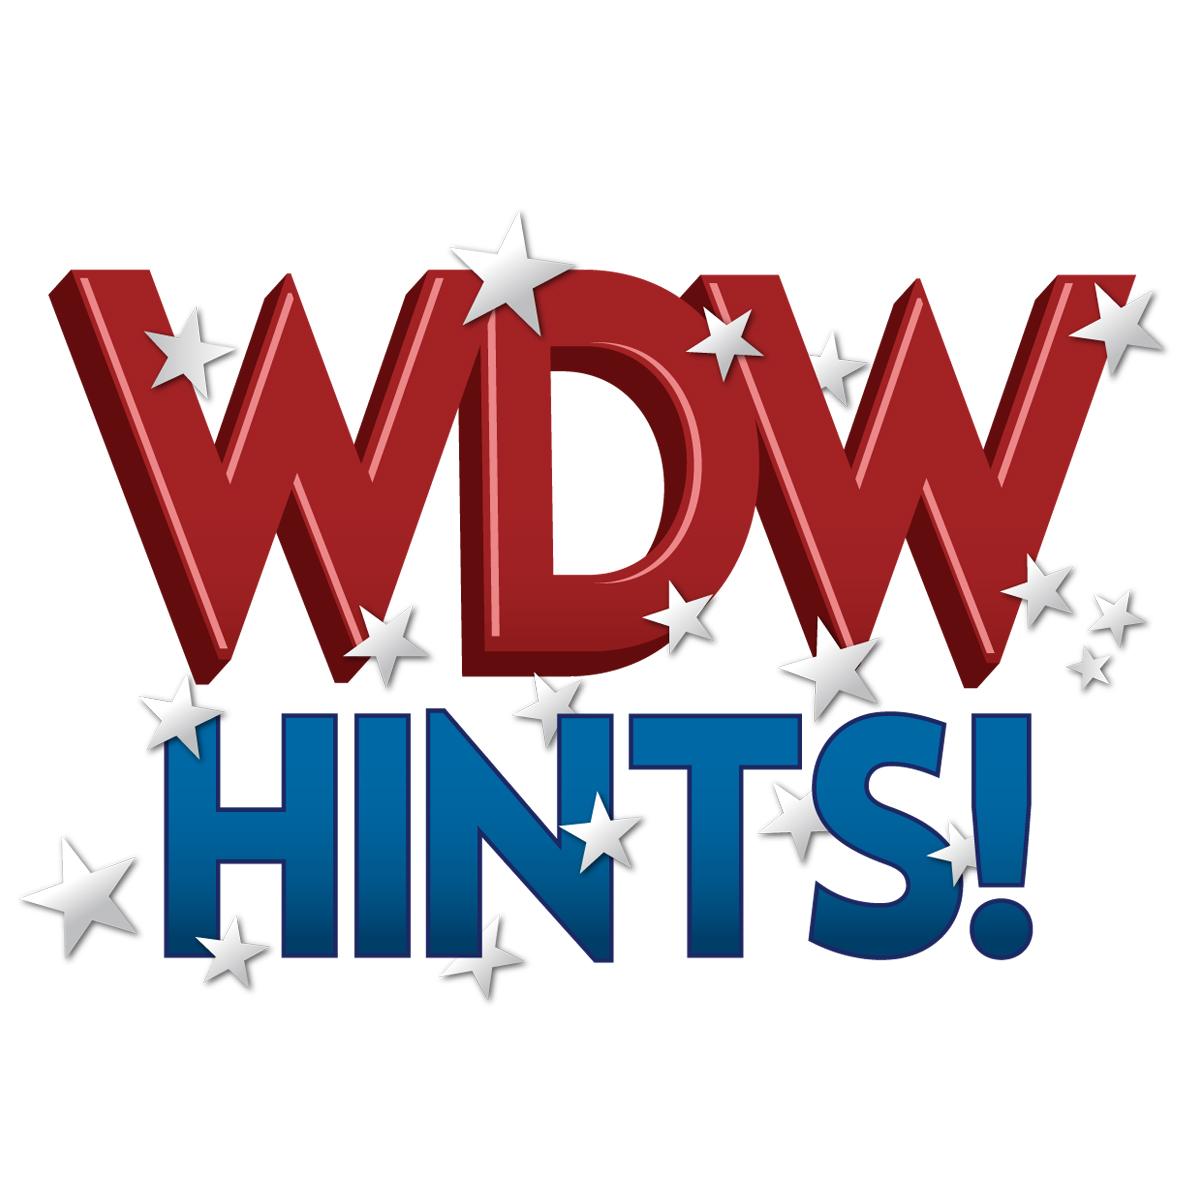 WDW Hints - White.jpg